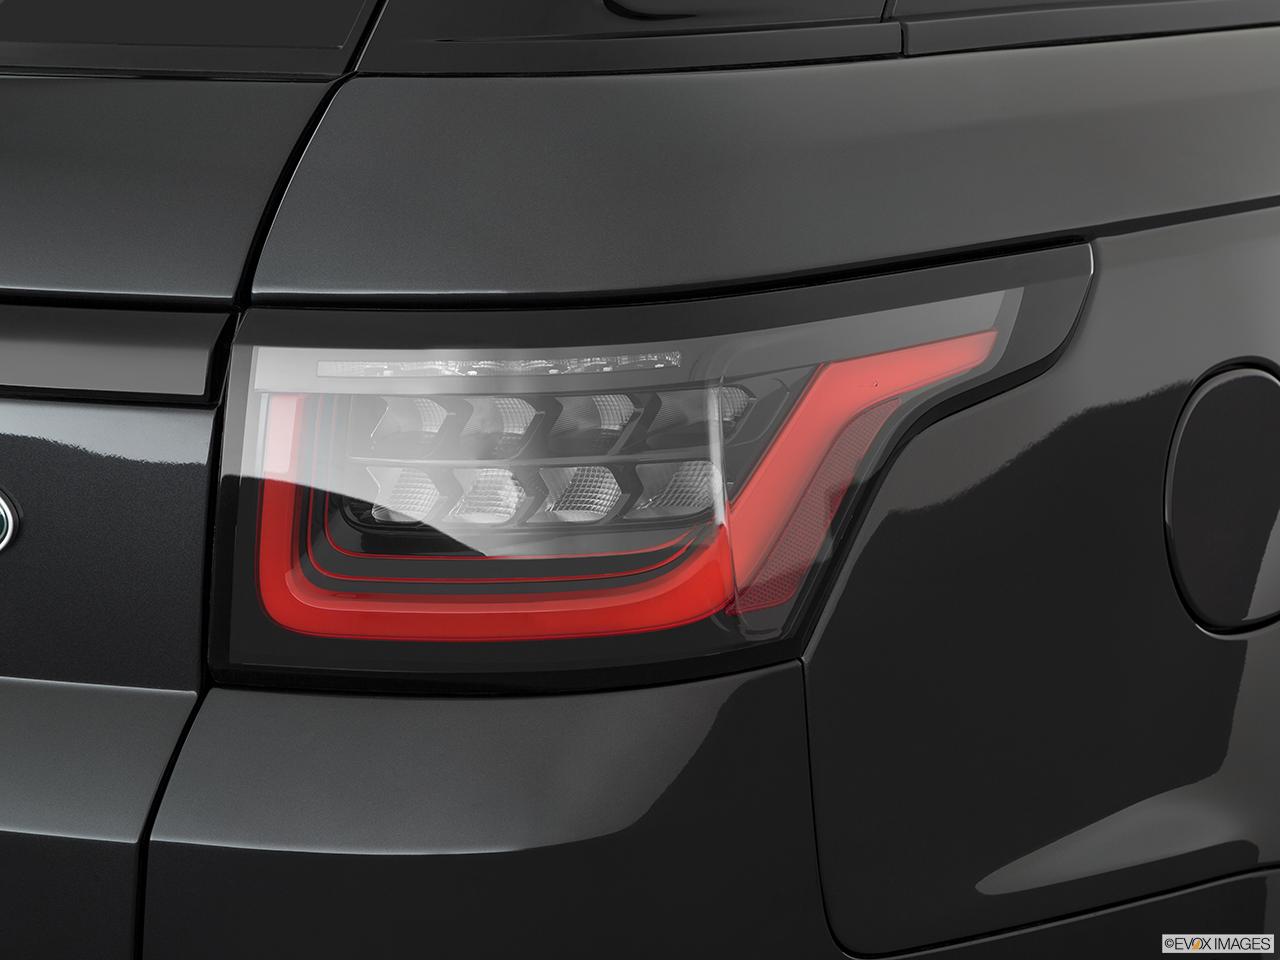 2019 Land Rover Range Rover Sport photo